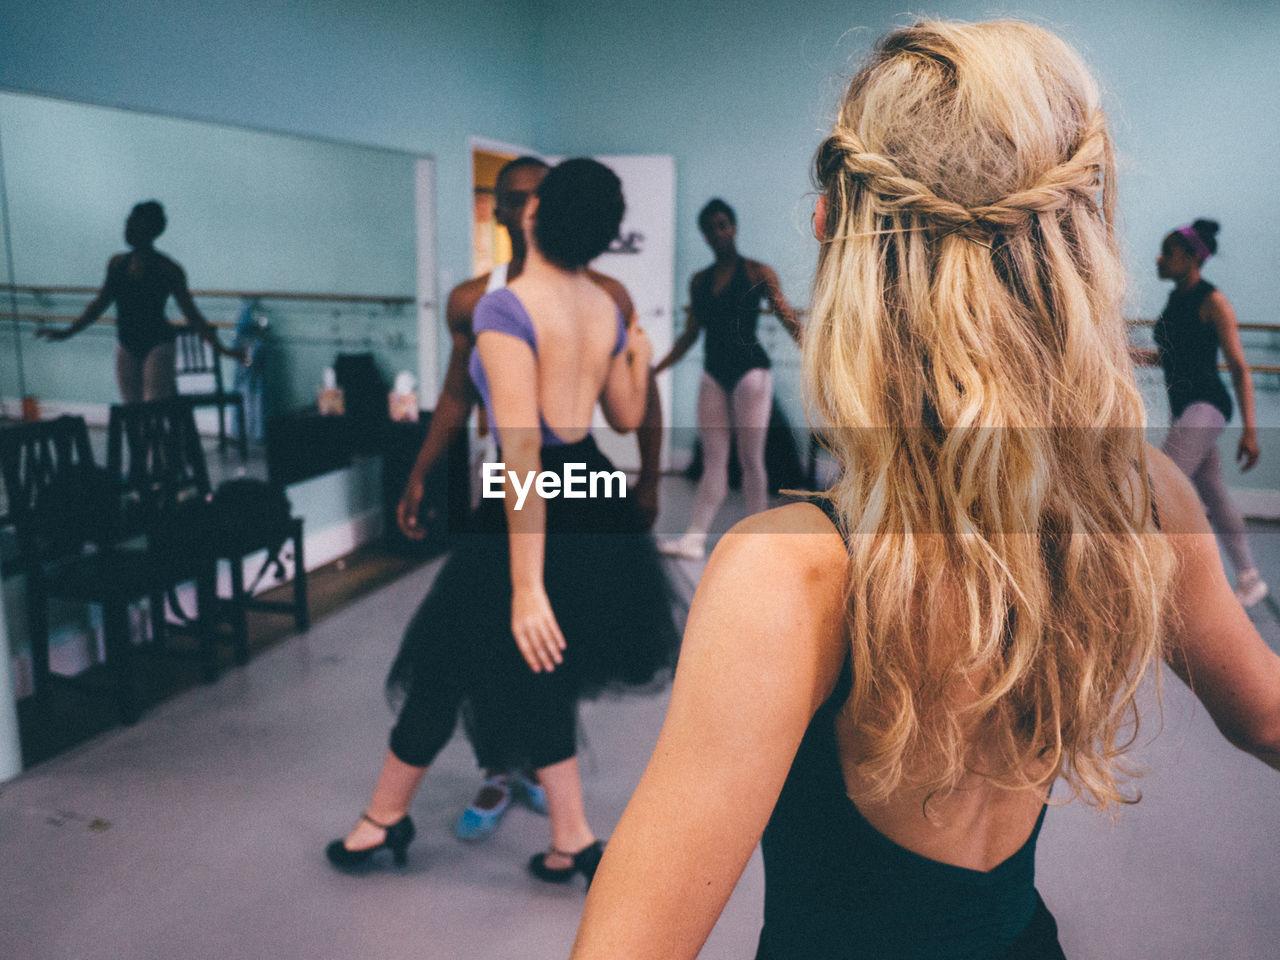 Ballet Dancers At Studio